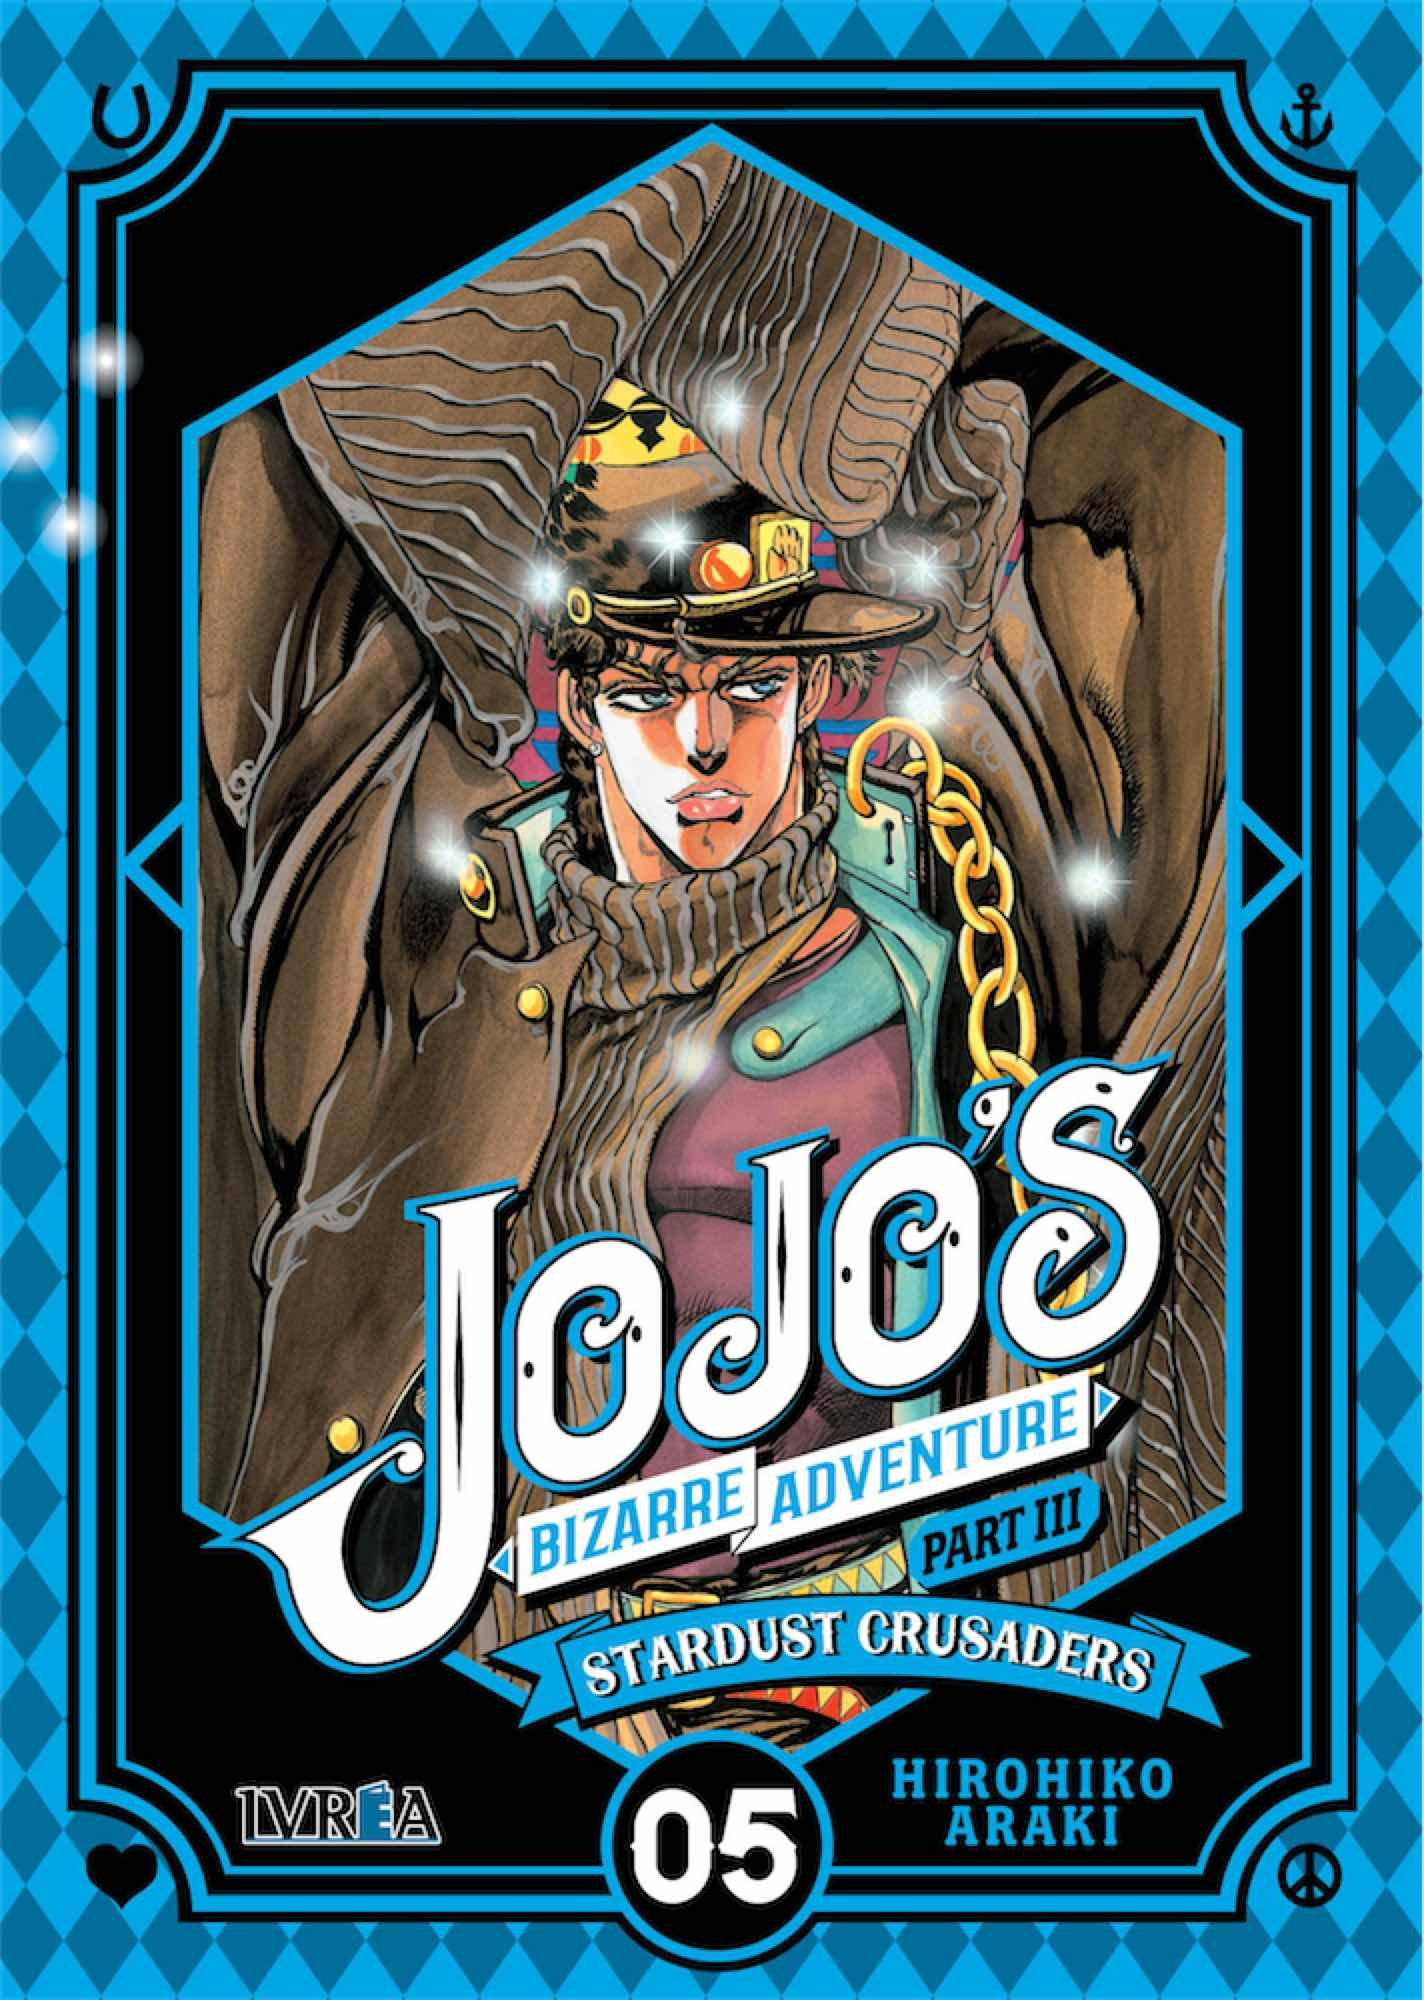 JojoS Bizarre Adventure 12. Stardust Crusaders 5: Amazon.es: Hirohiko Araki: Libros